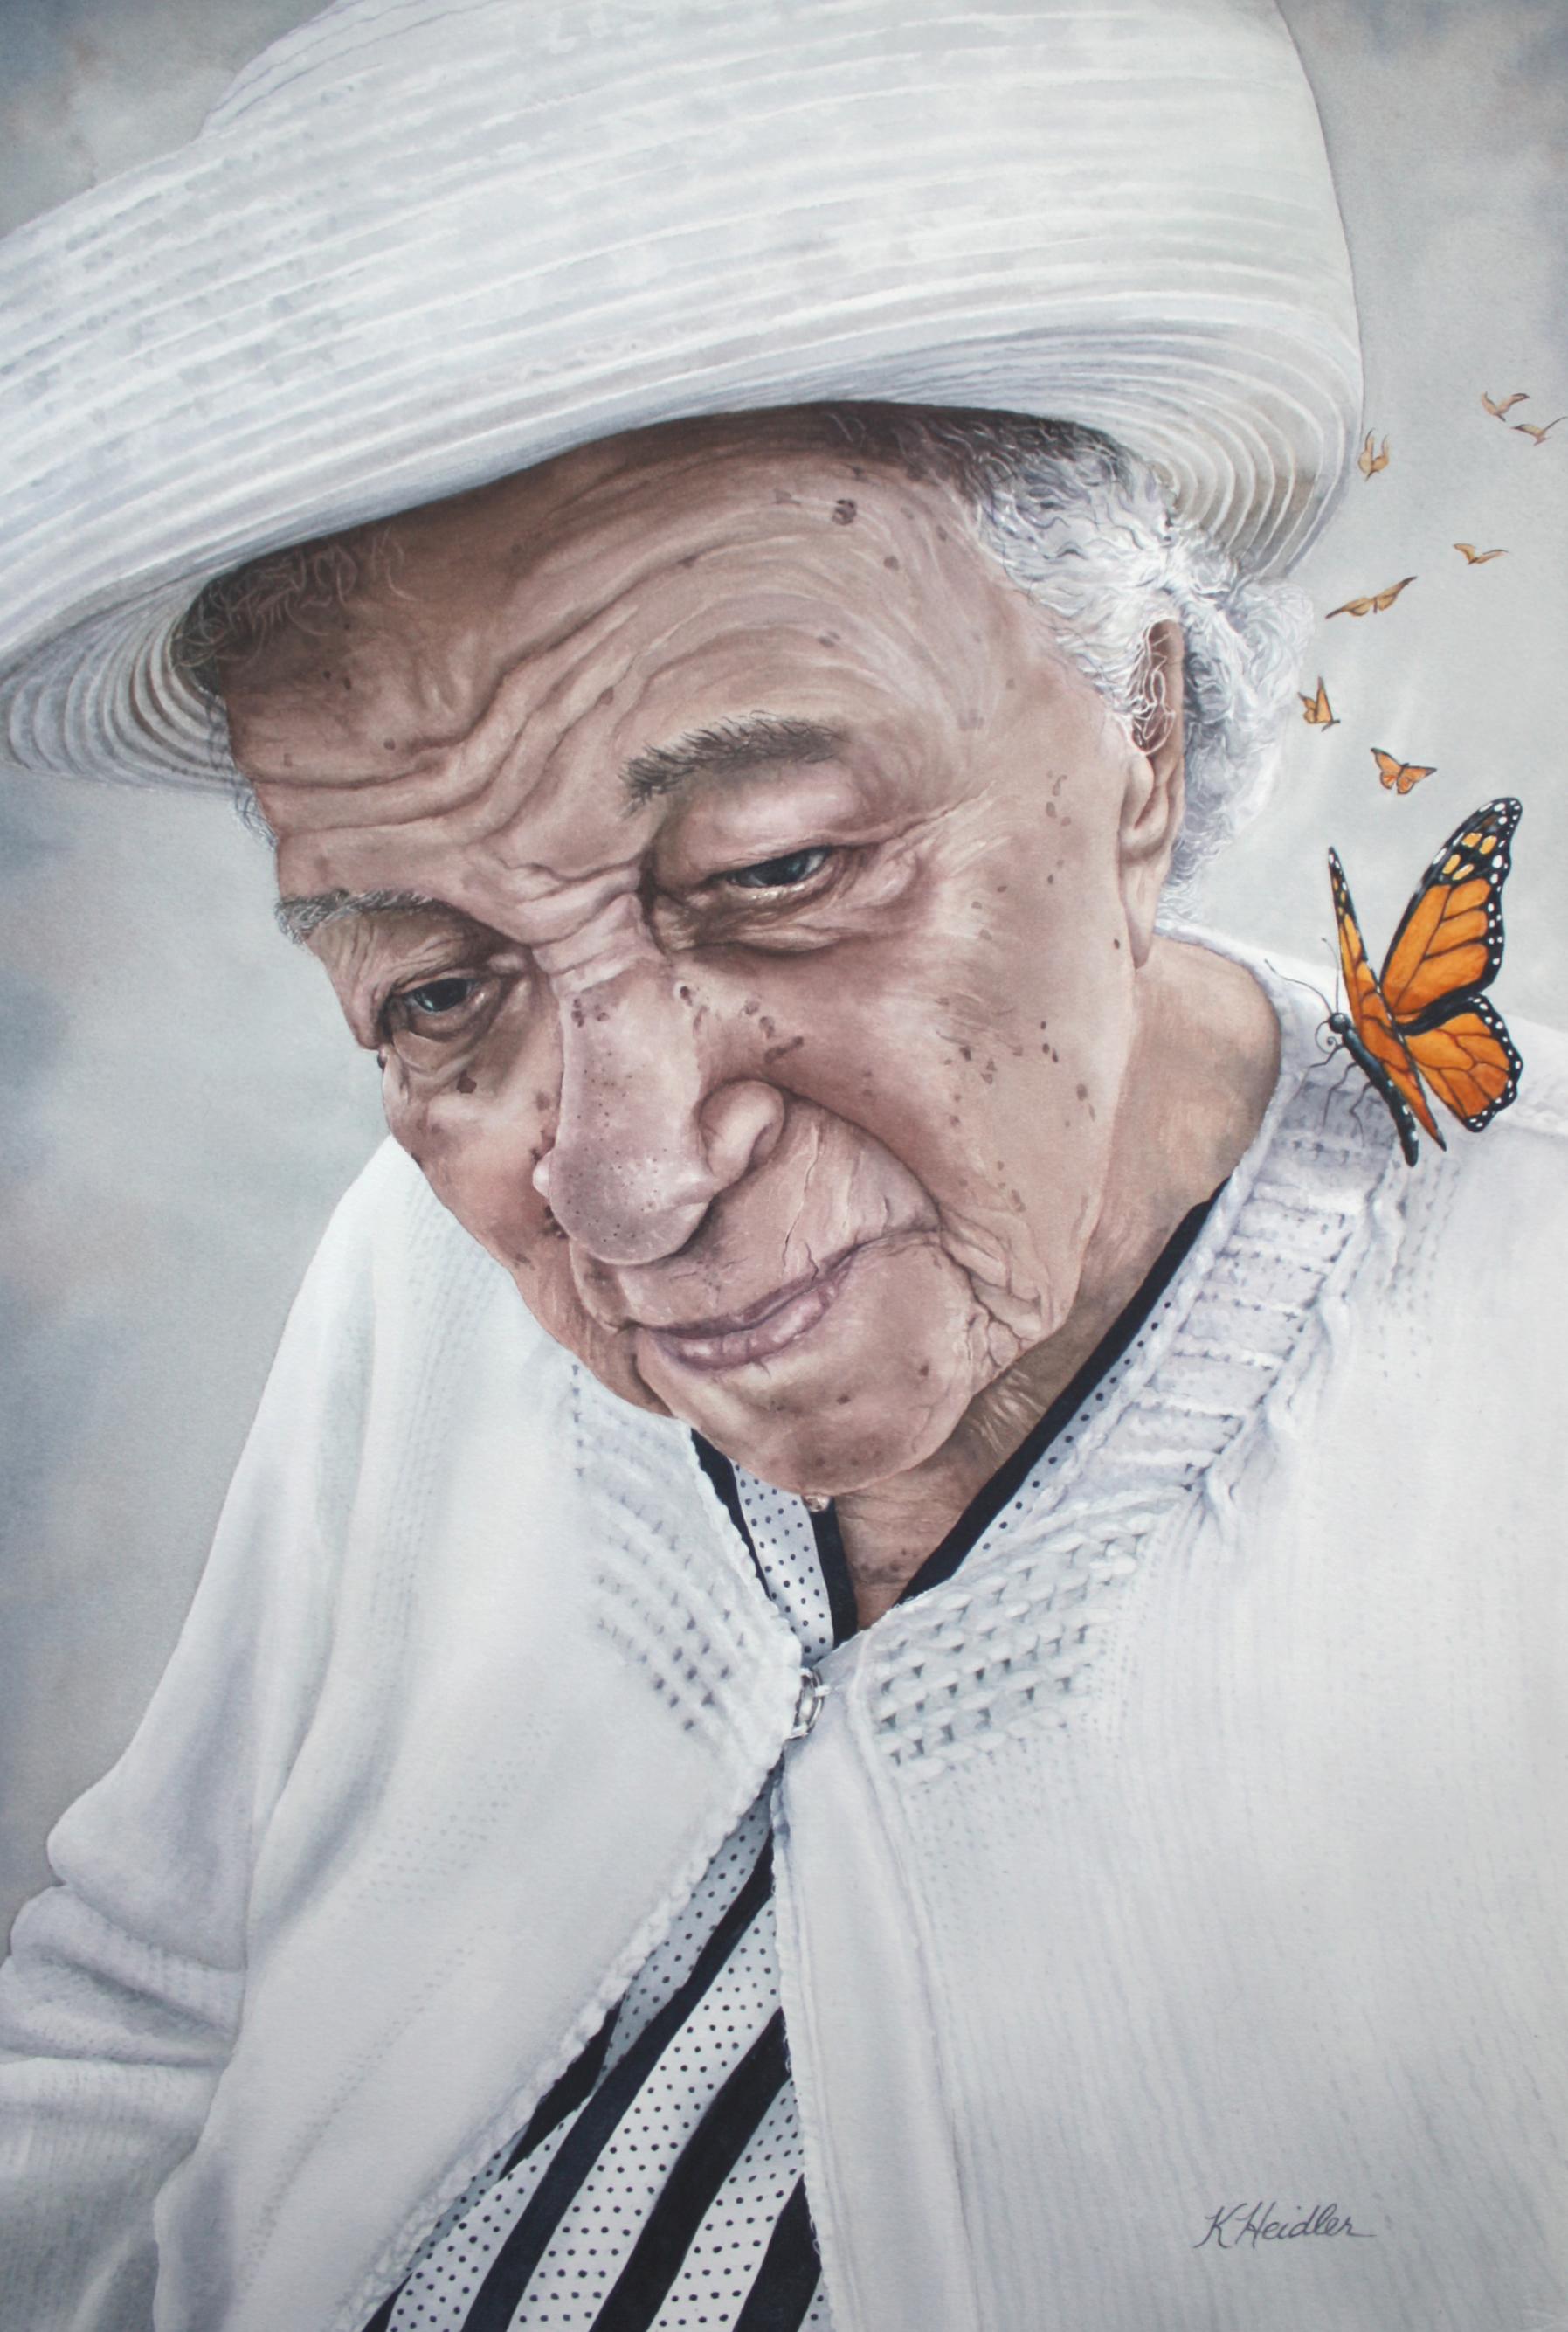 Memories Like Butterflies